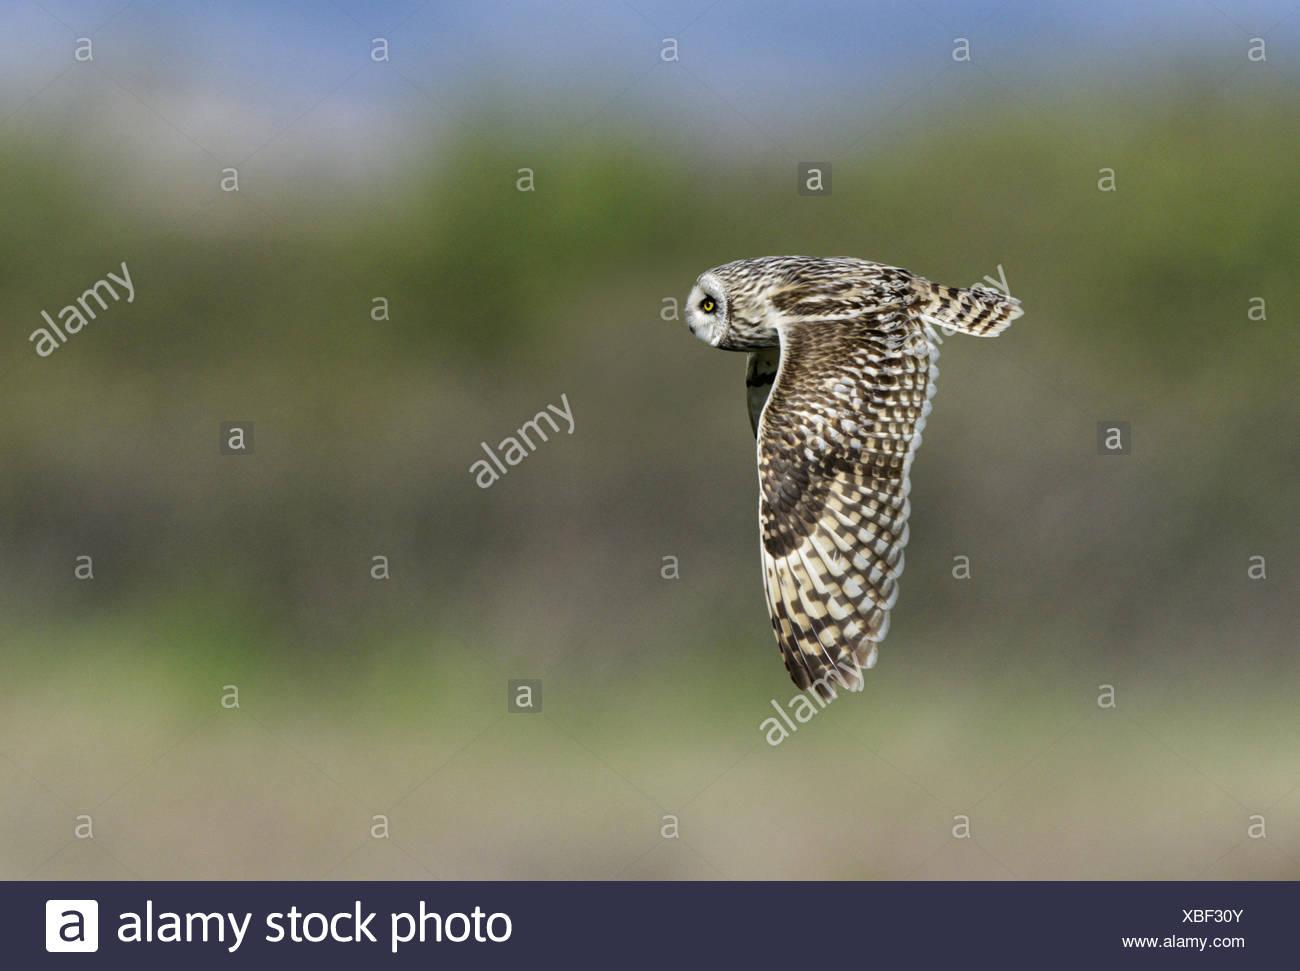 Corto-eared Owl - asio flammeus Immagini Stock